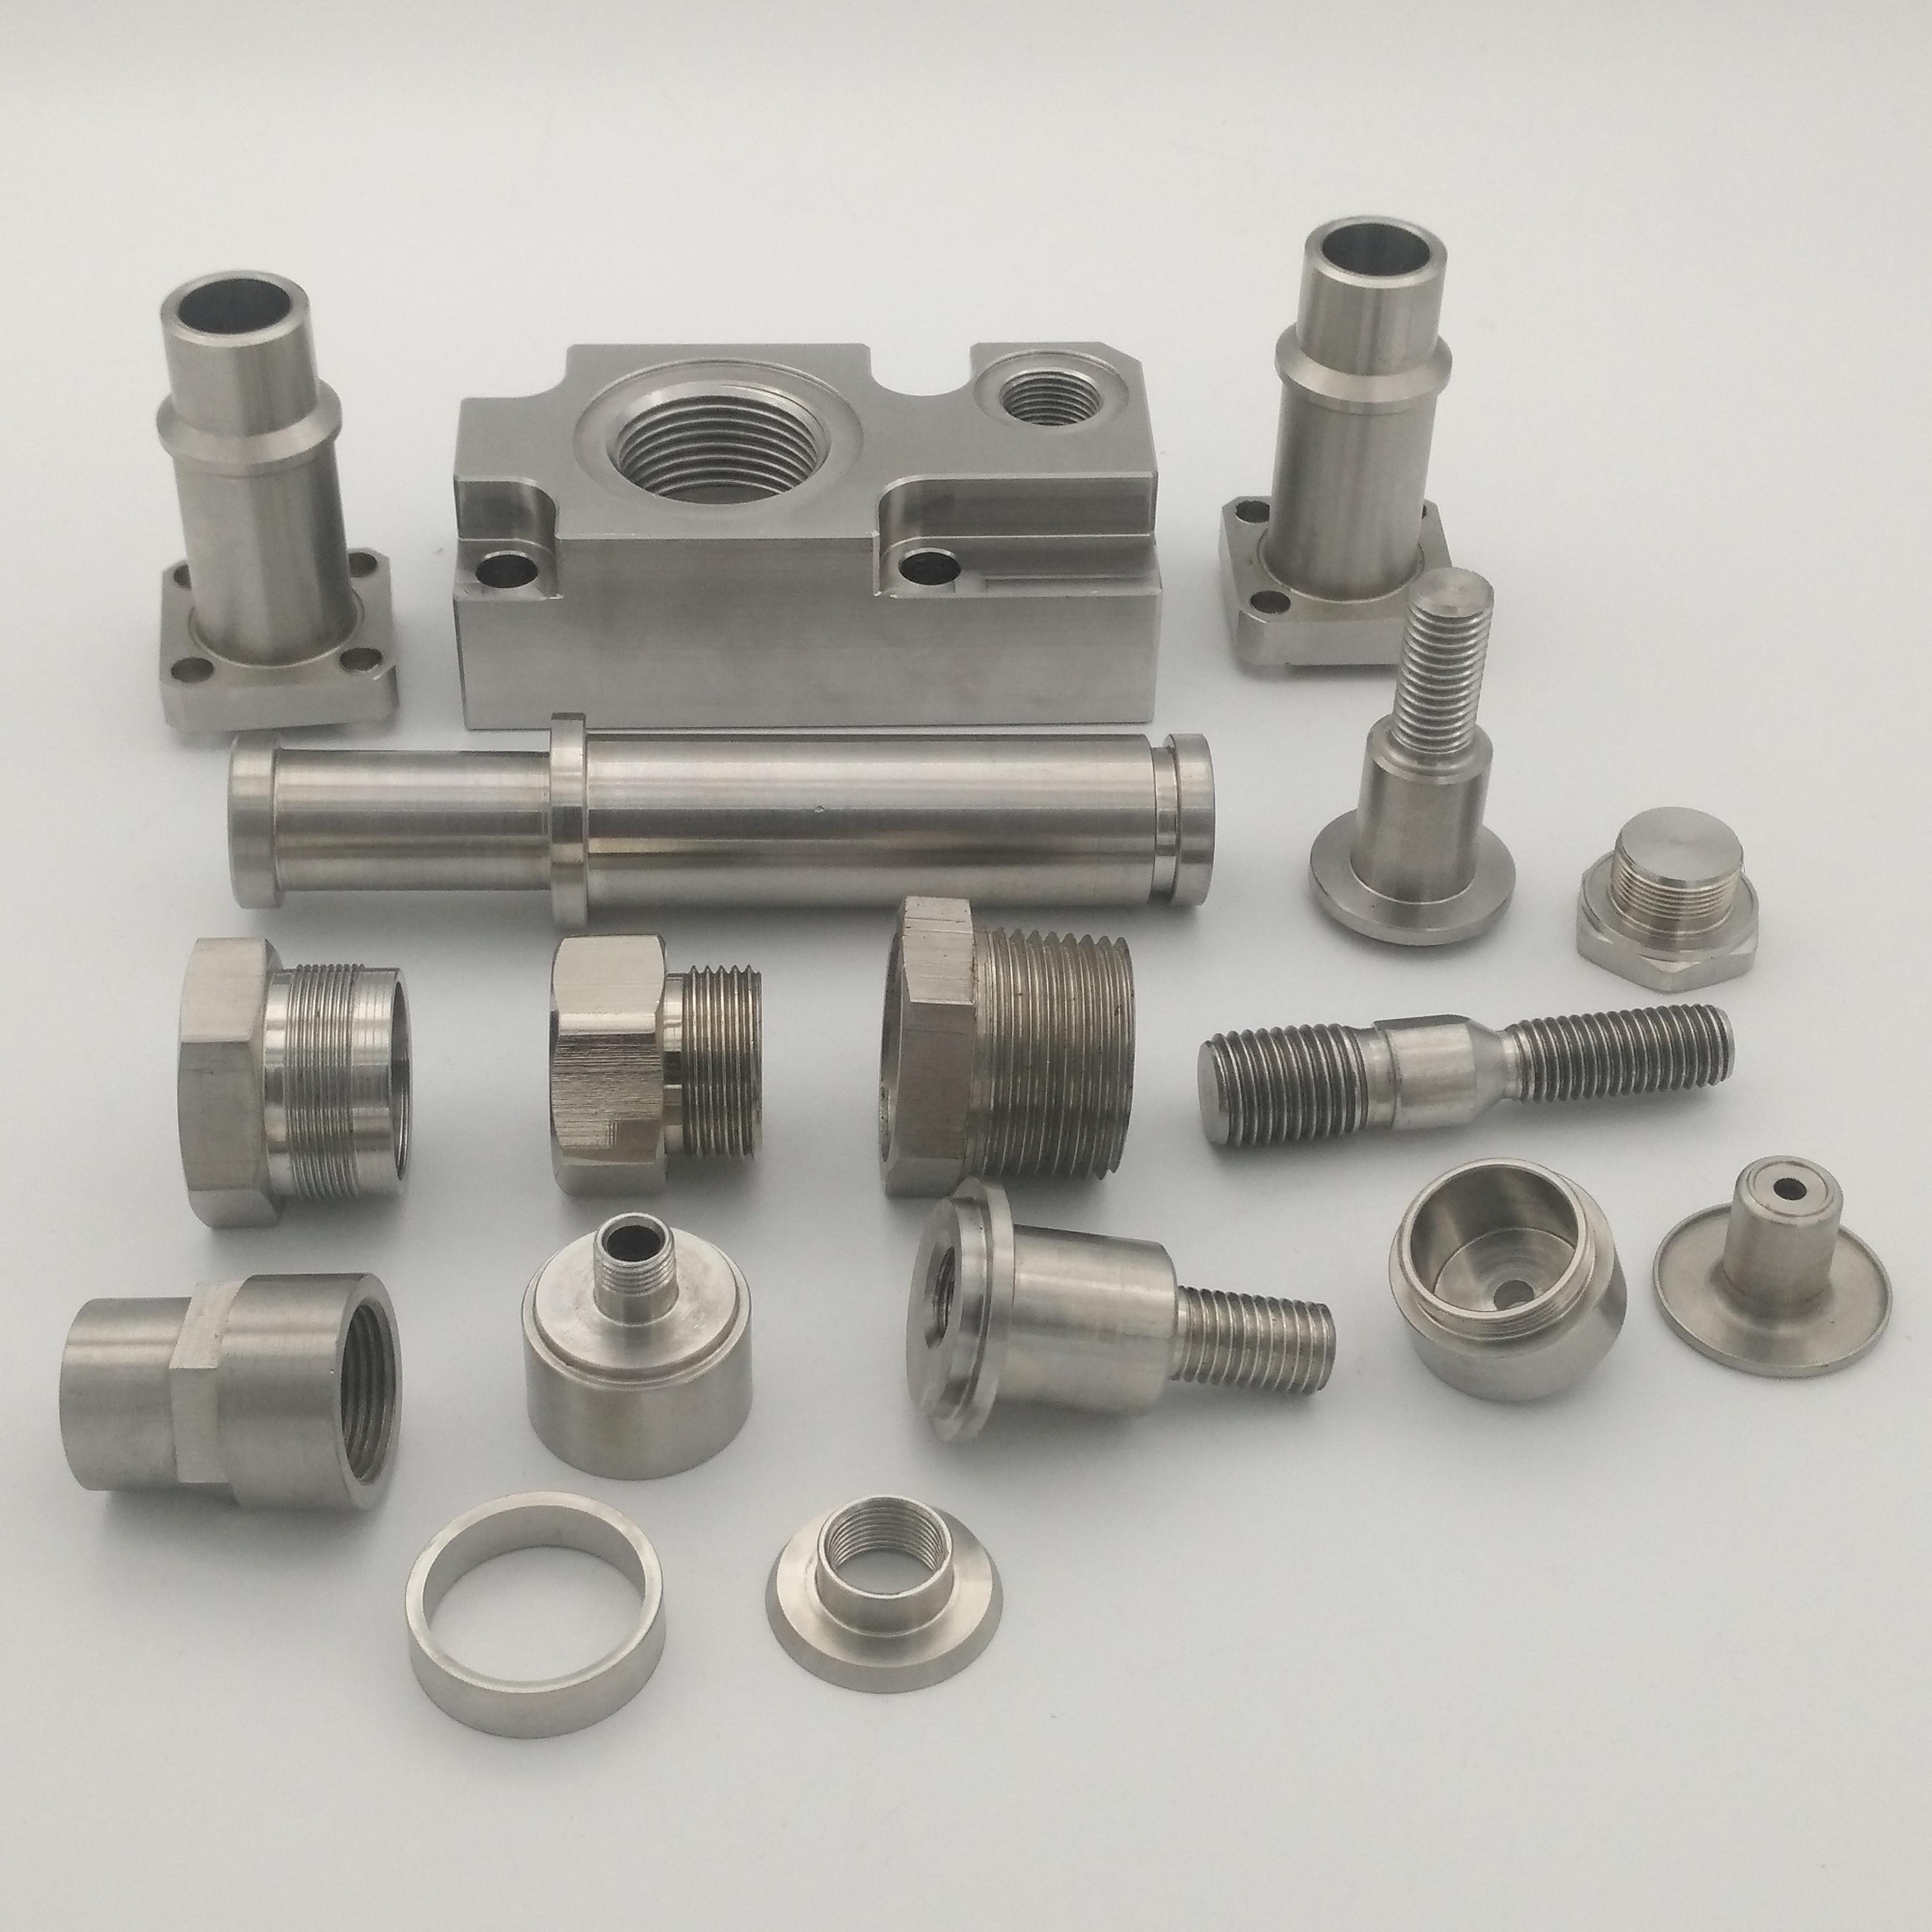 Cnc الدقة متعددة الوظائف المواد طحن الألومنيوم cnc الآلات رخيصة الصلب تحولت جزء